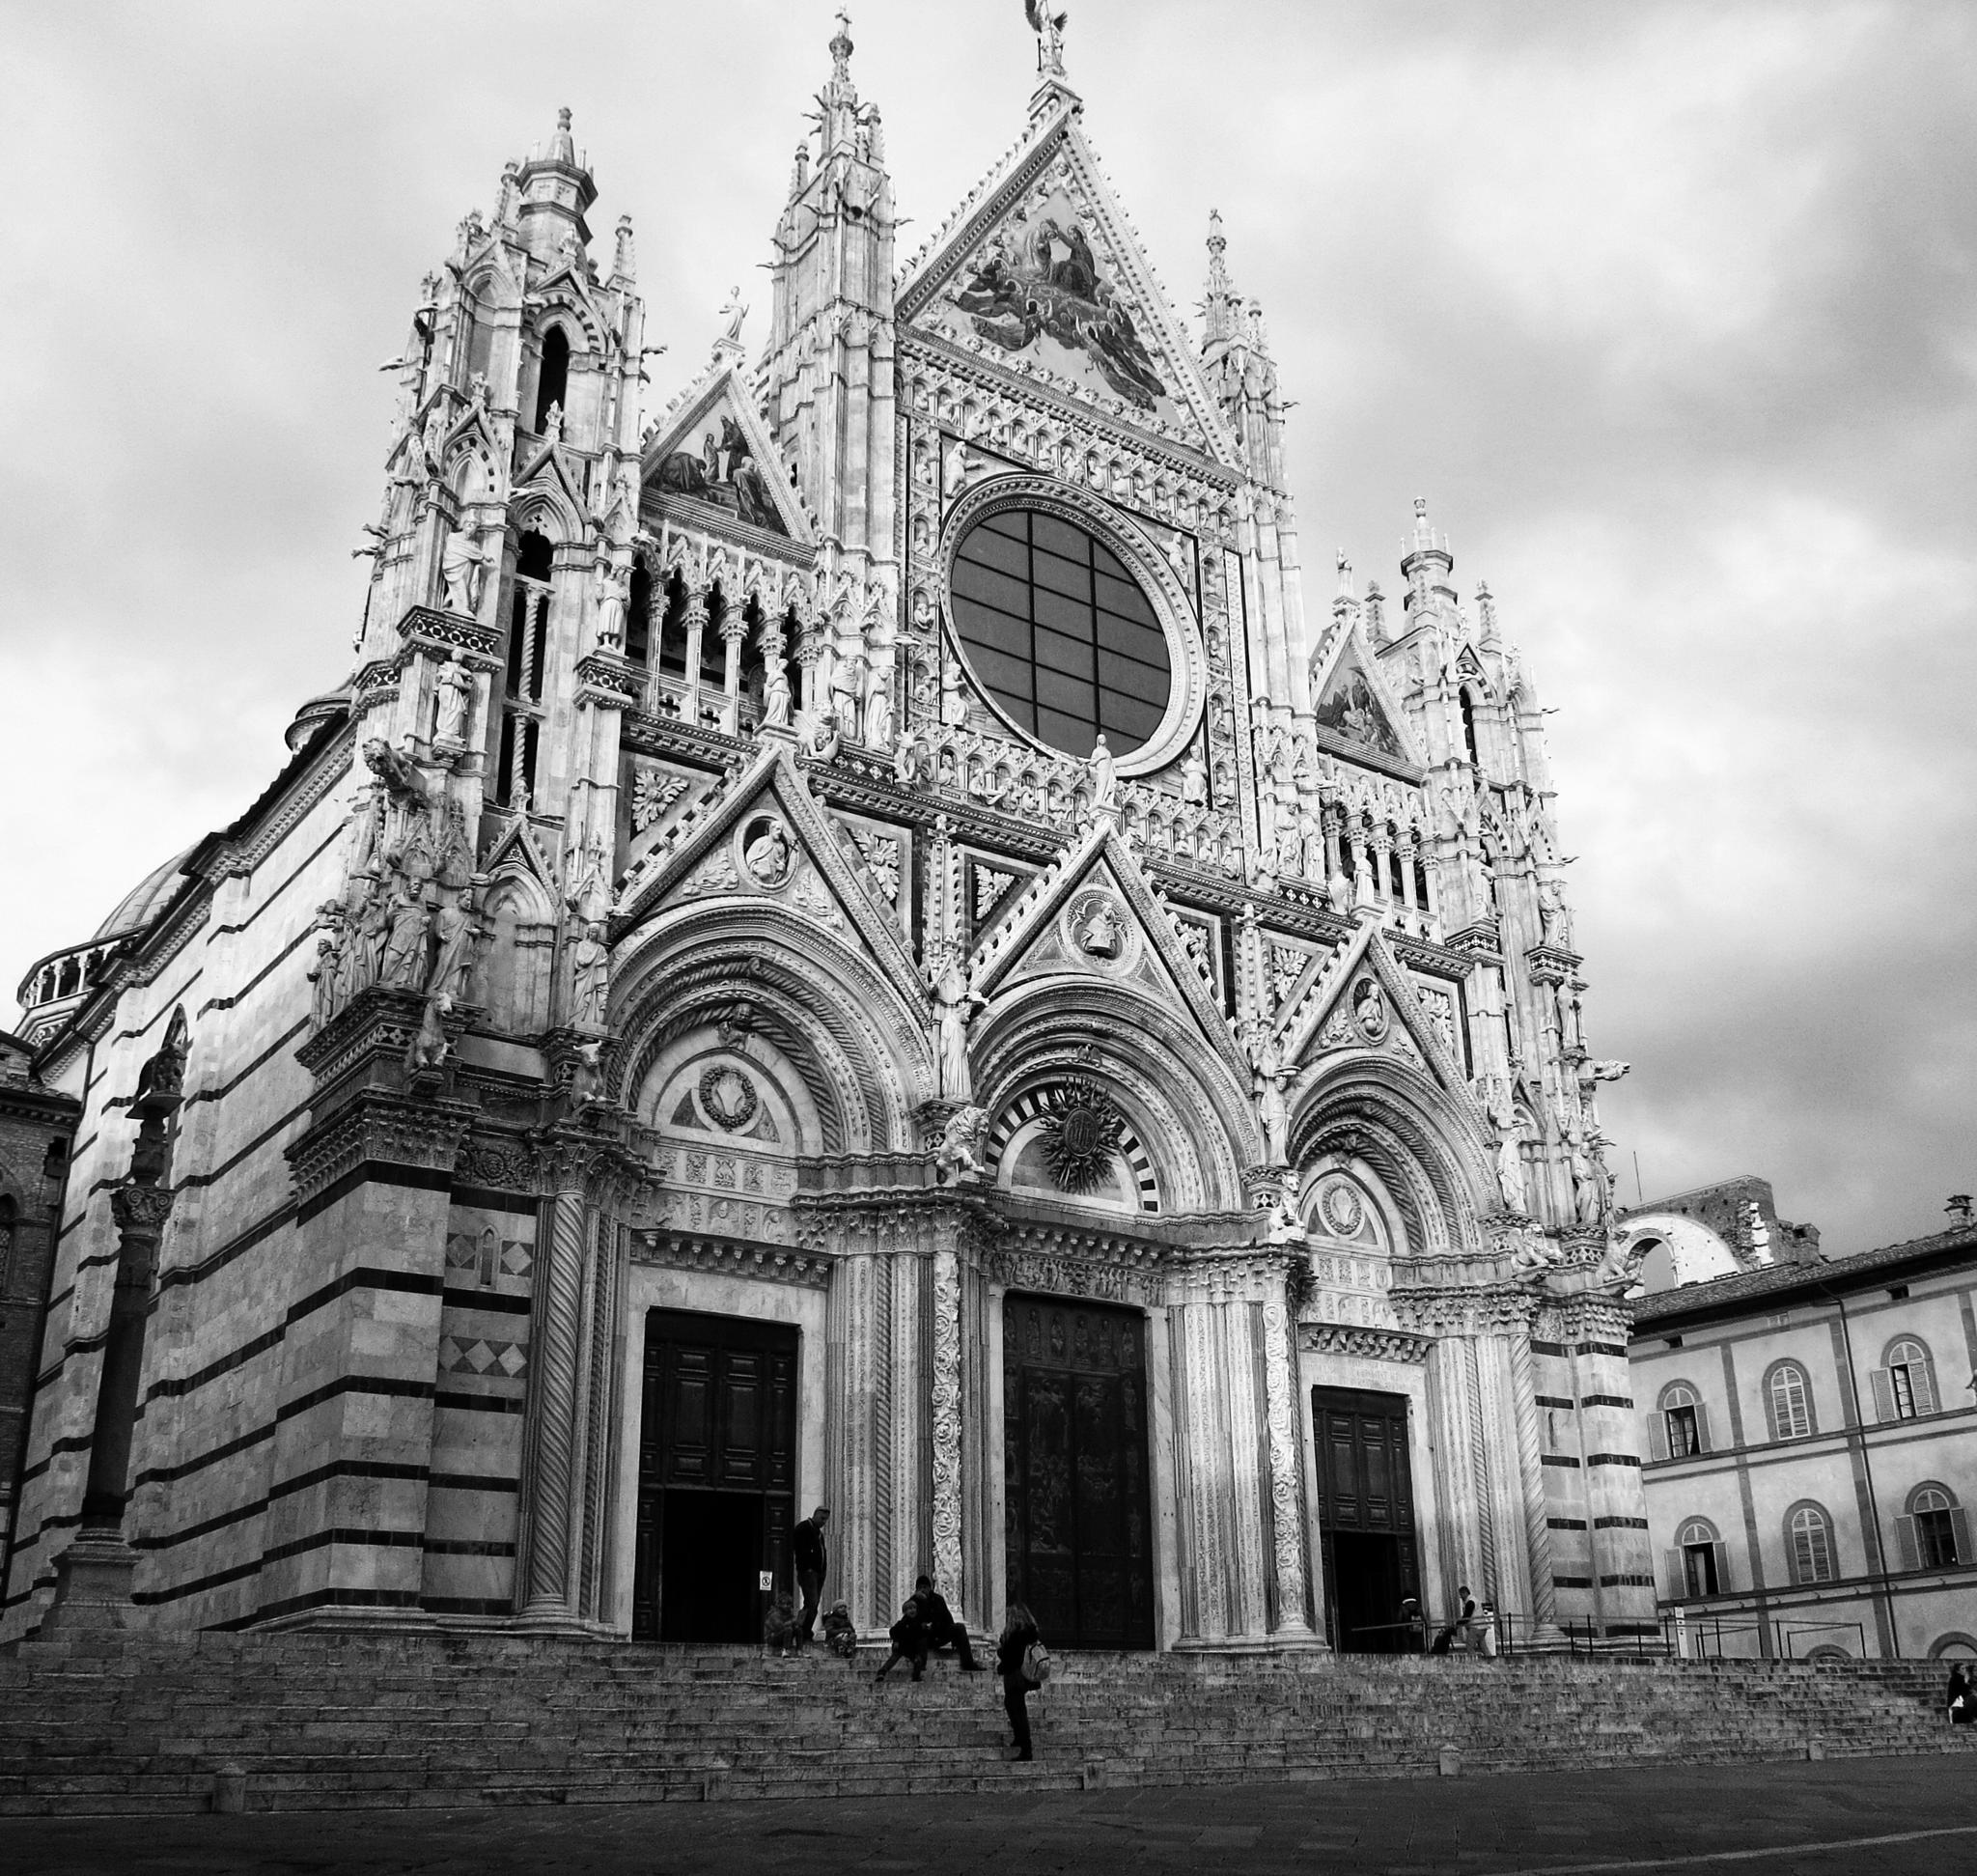 Duomo Santa Maria Siena by Adi Gli